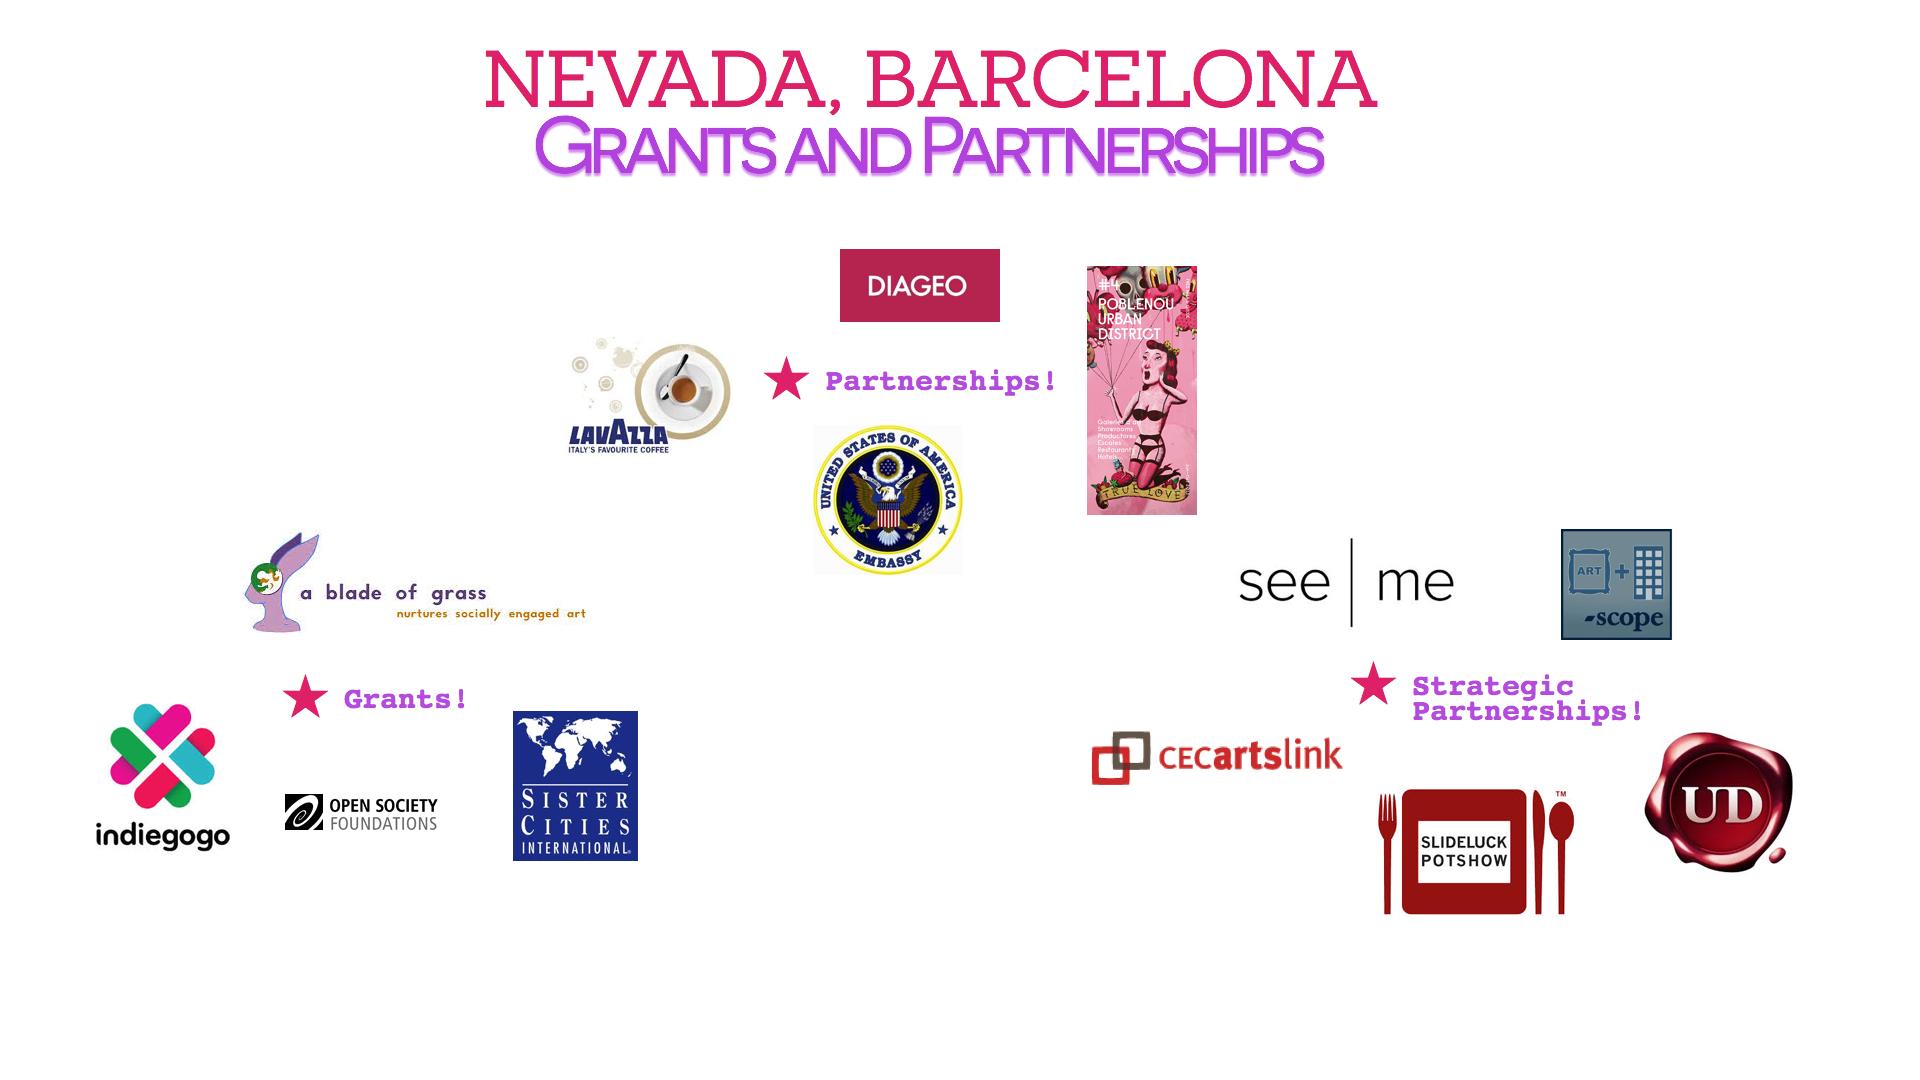 Grants and Partnerships